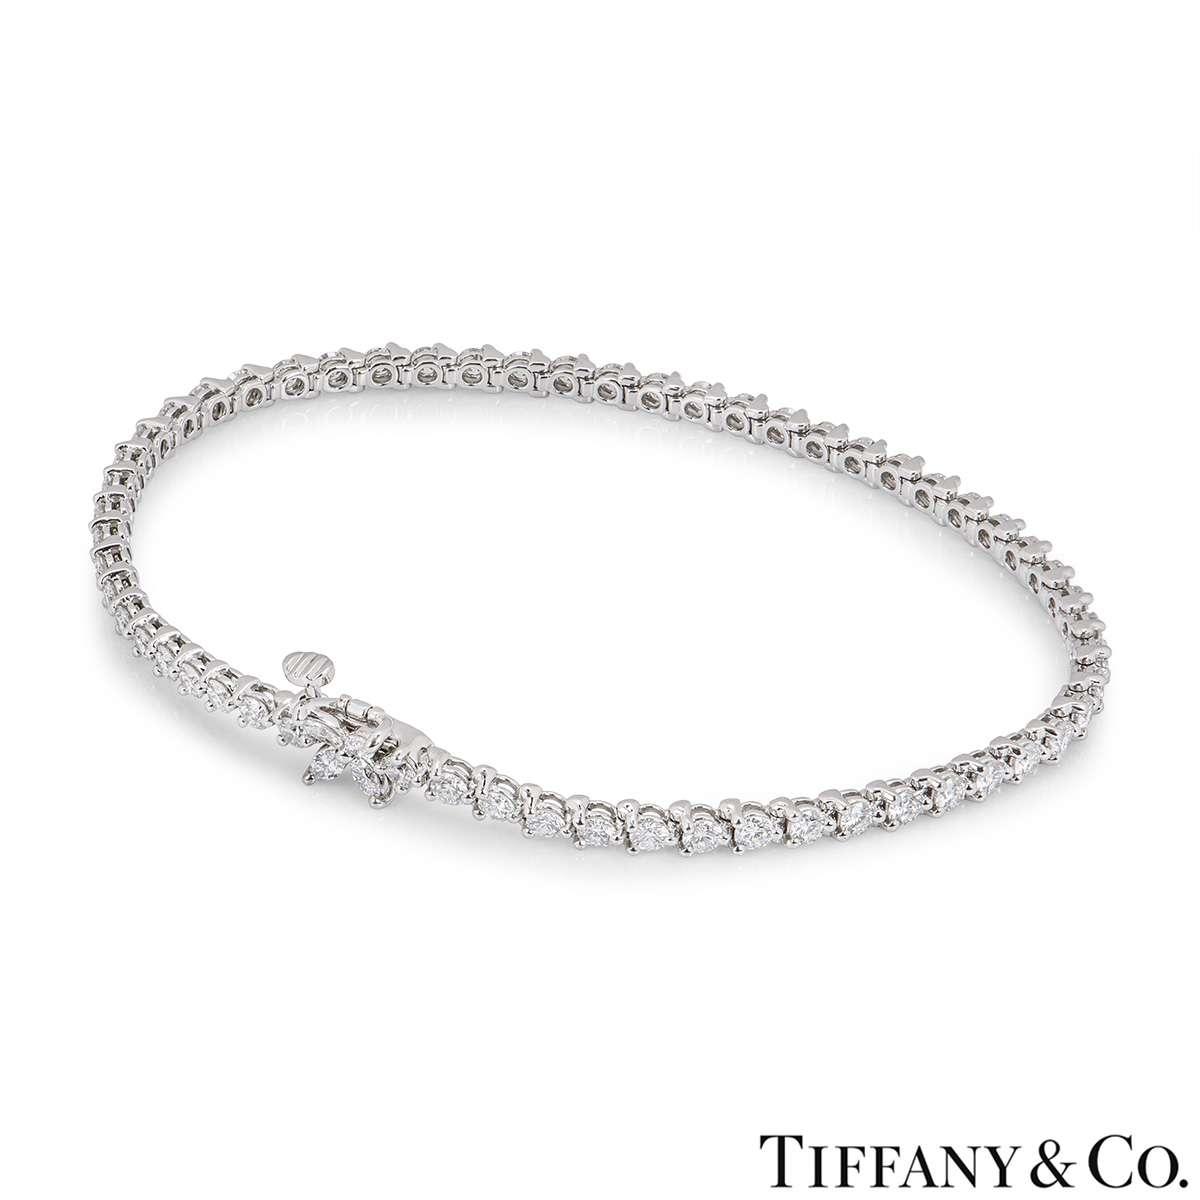 Tiffany & Co. Platinum Diamond Victoria Bracelet